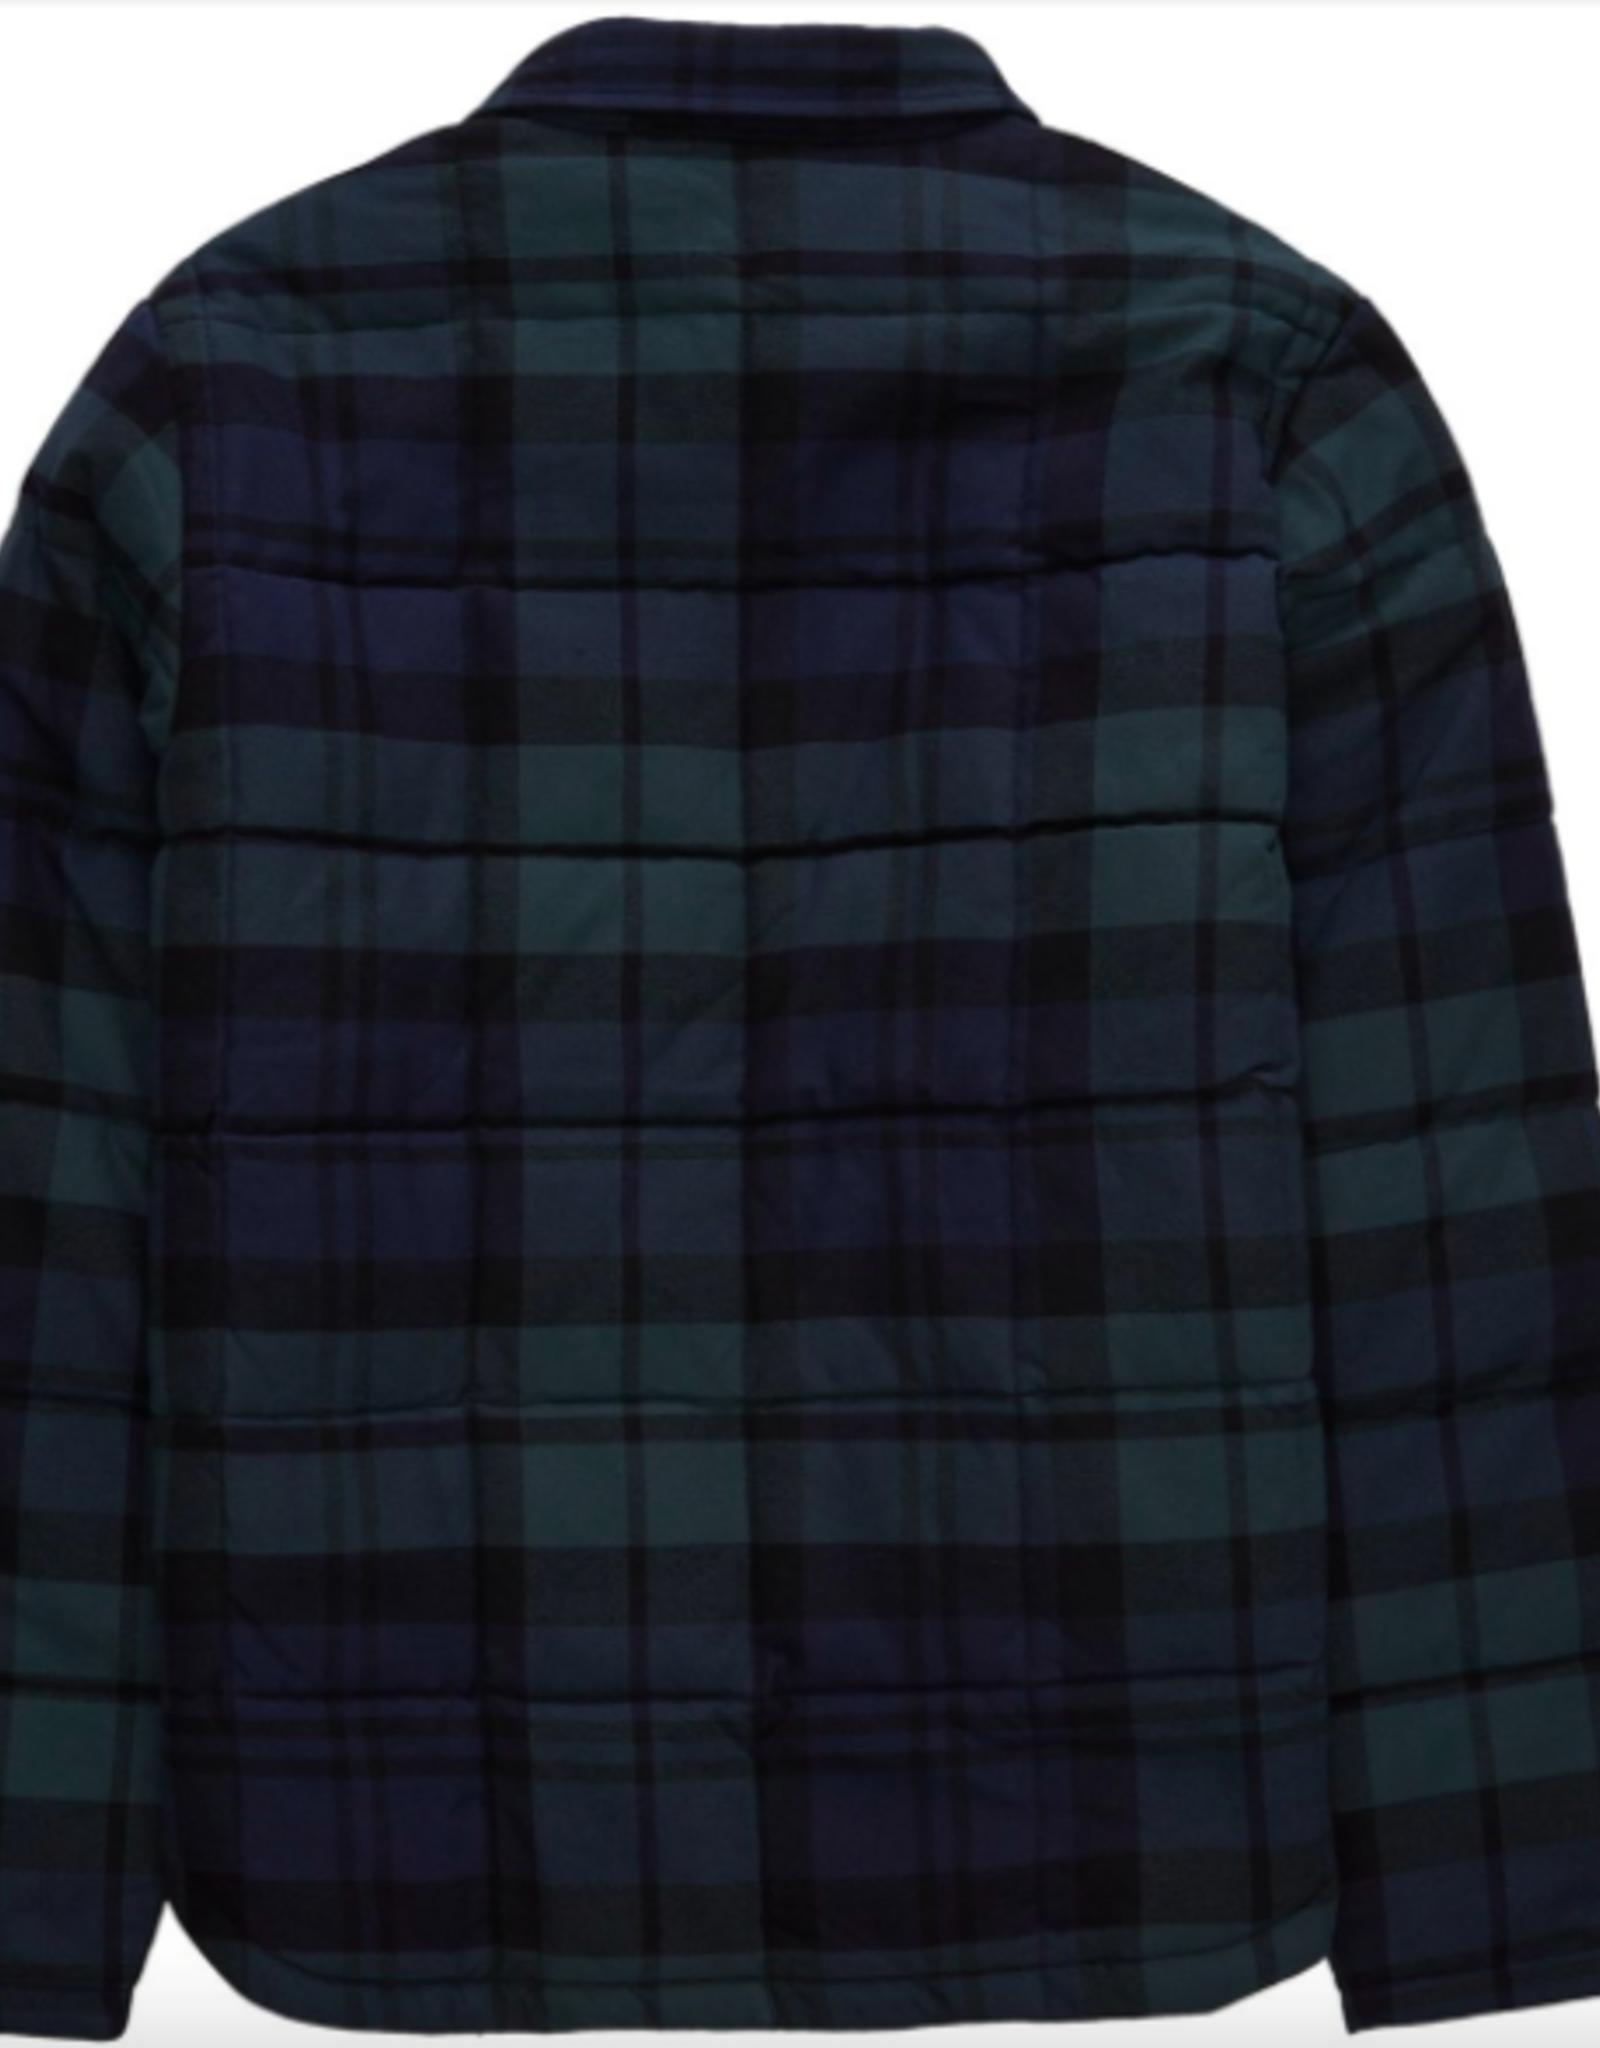 Element Men's Lodge Shirt Flannel Jacket